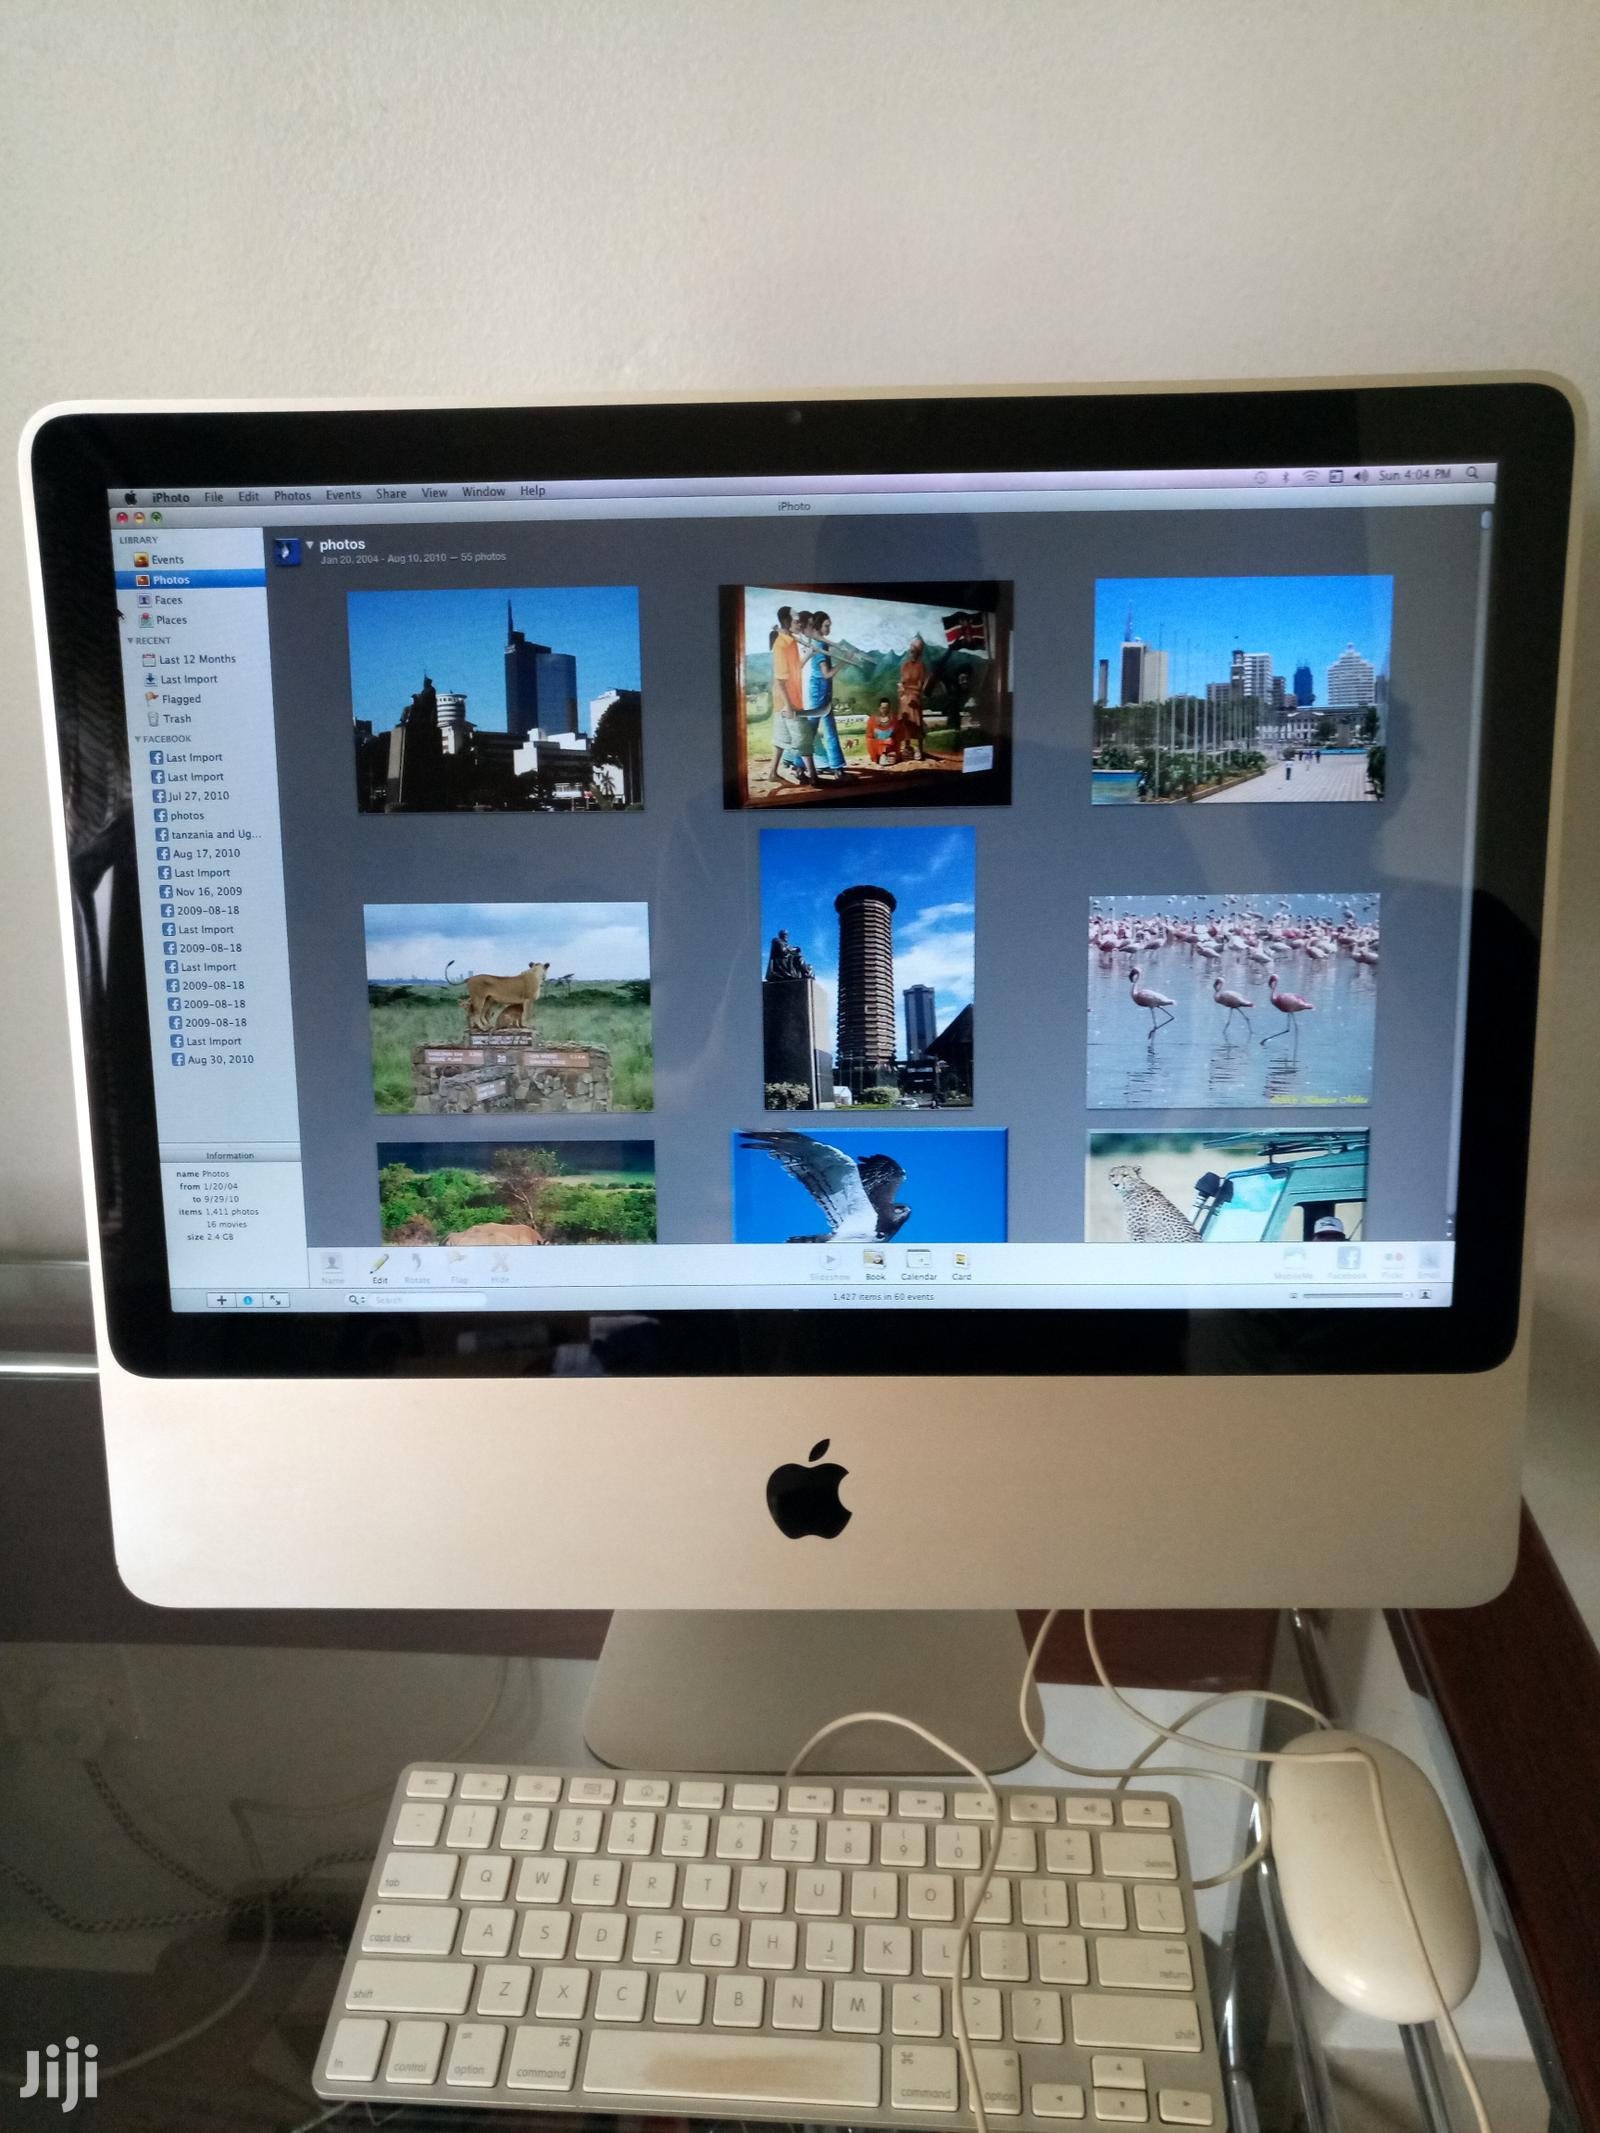 Archive: Desktop Computer Apple iMac 2GB Intel Core 2 Duo HDD 500GB